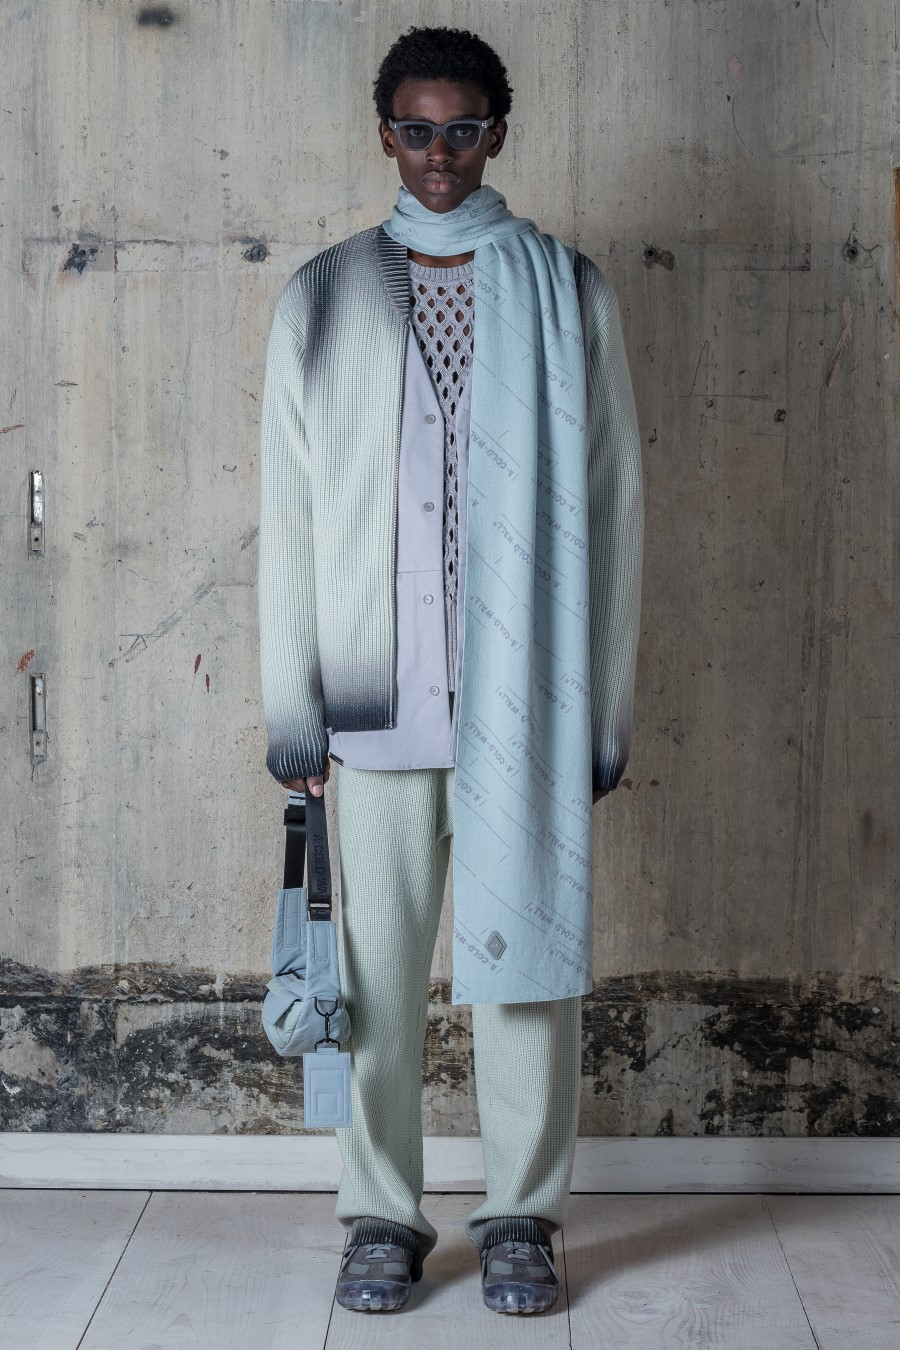 A-COLD-WALL* Fall Winter 2021 - Milan Fashion Week Men'sA-COLD-WALL* Fall Winter 2021 - Milan Fashion Week Men's